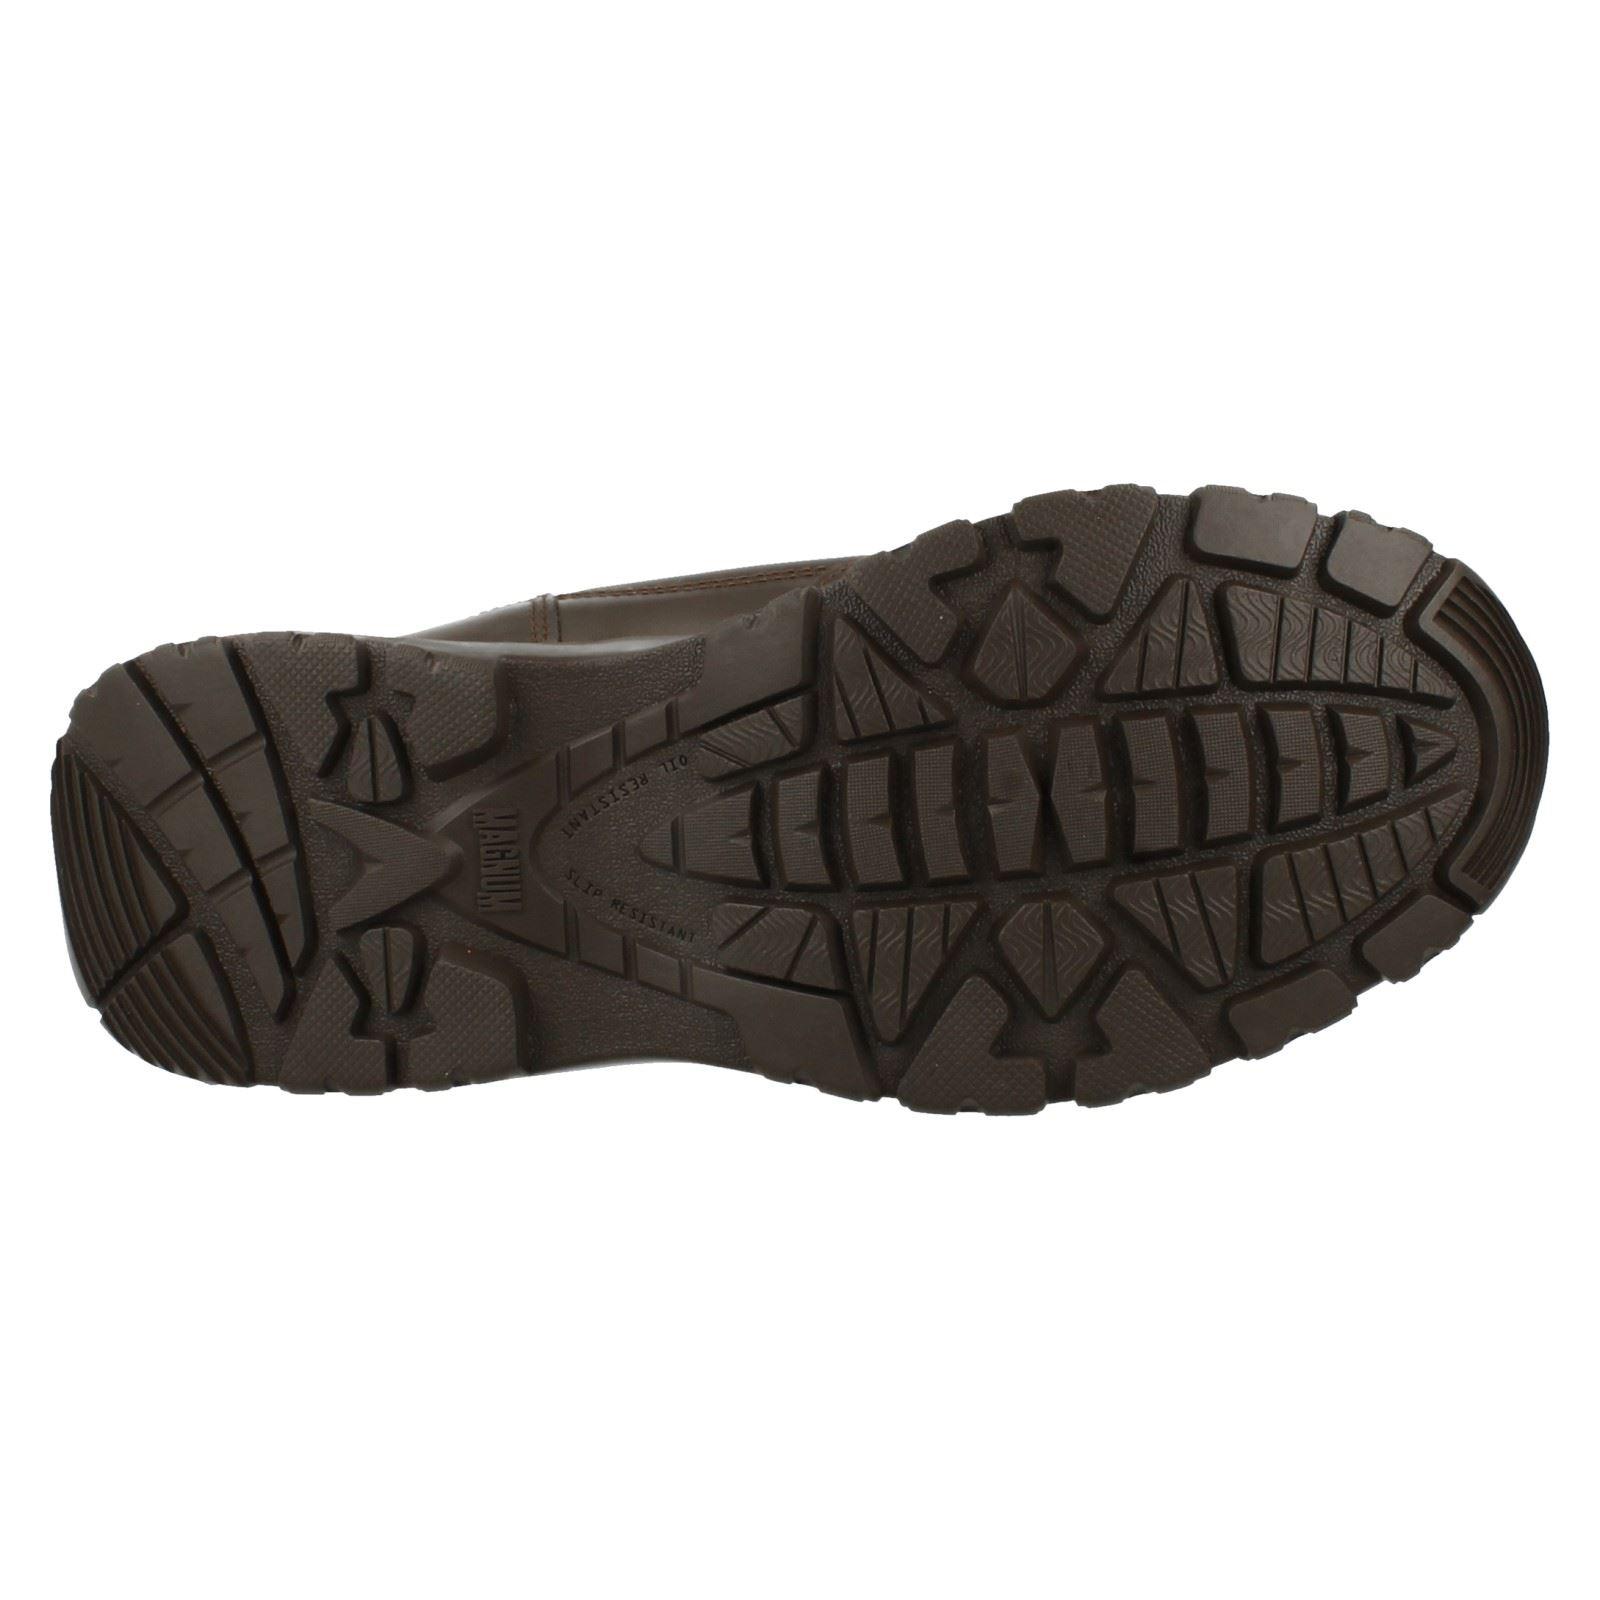 Hombre Magnum botas - Style Style Style Viper Pro 8.0 85644d